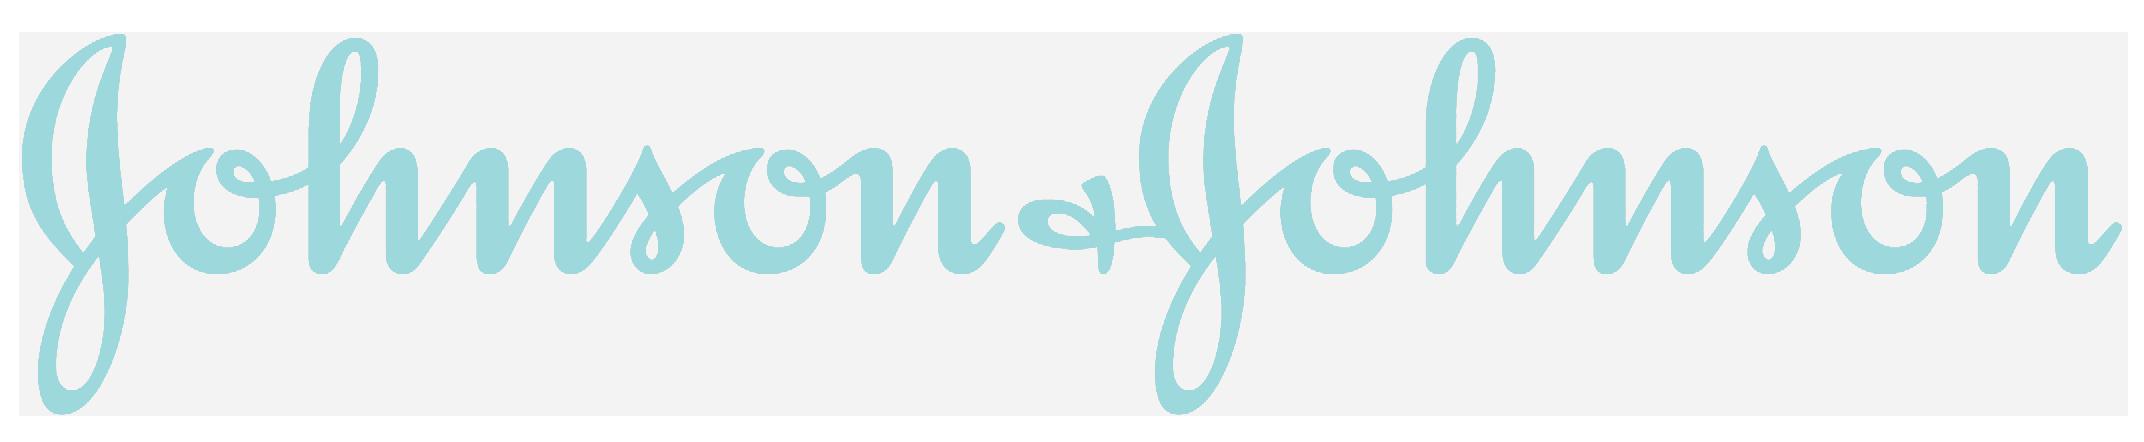 Johnson-Johnson-logo_aqua